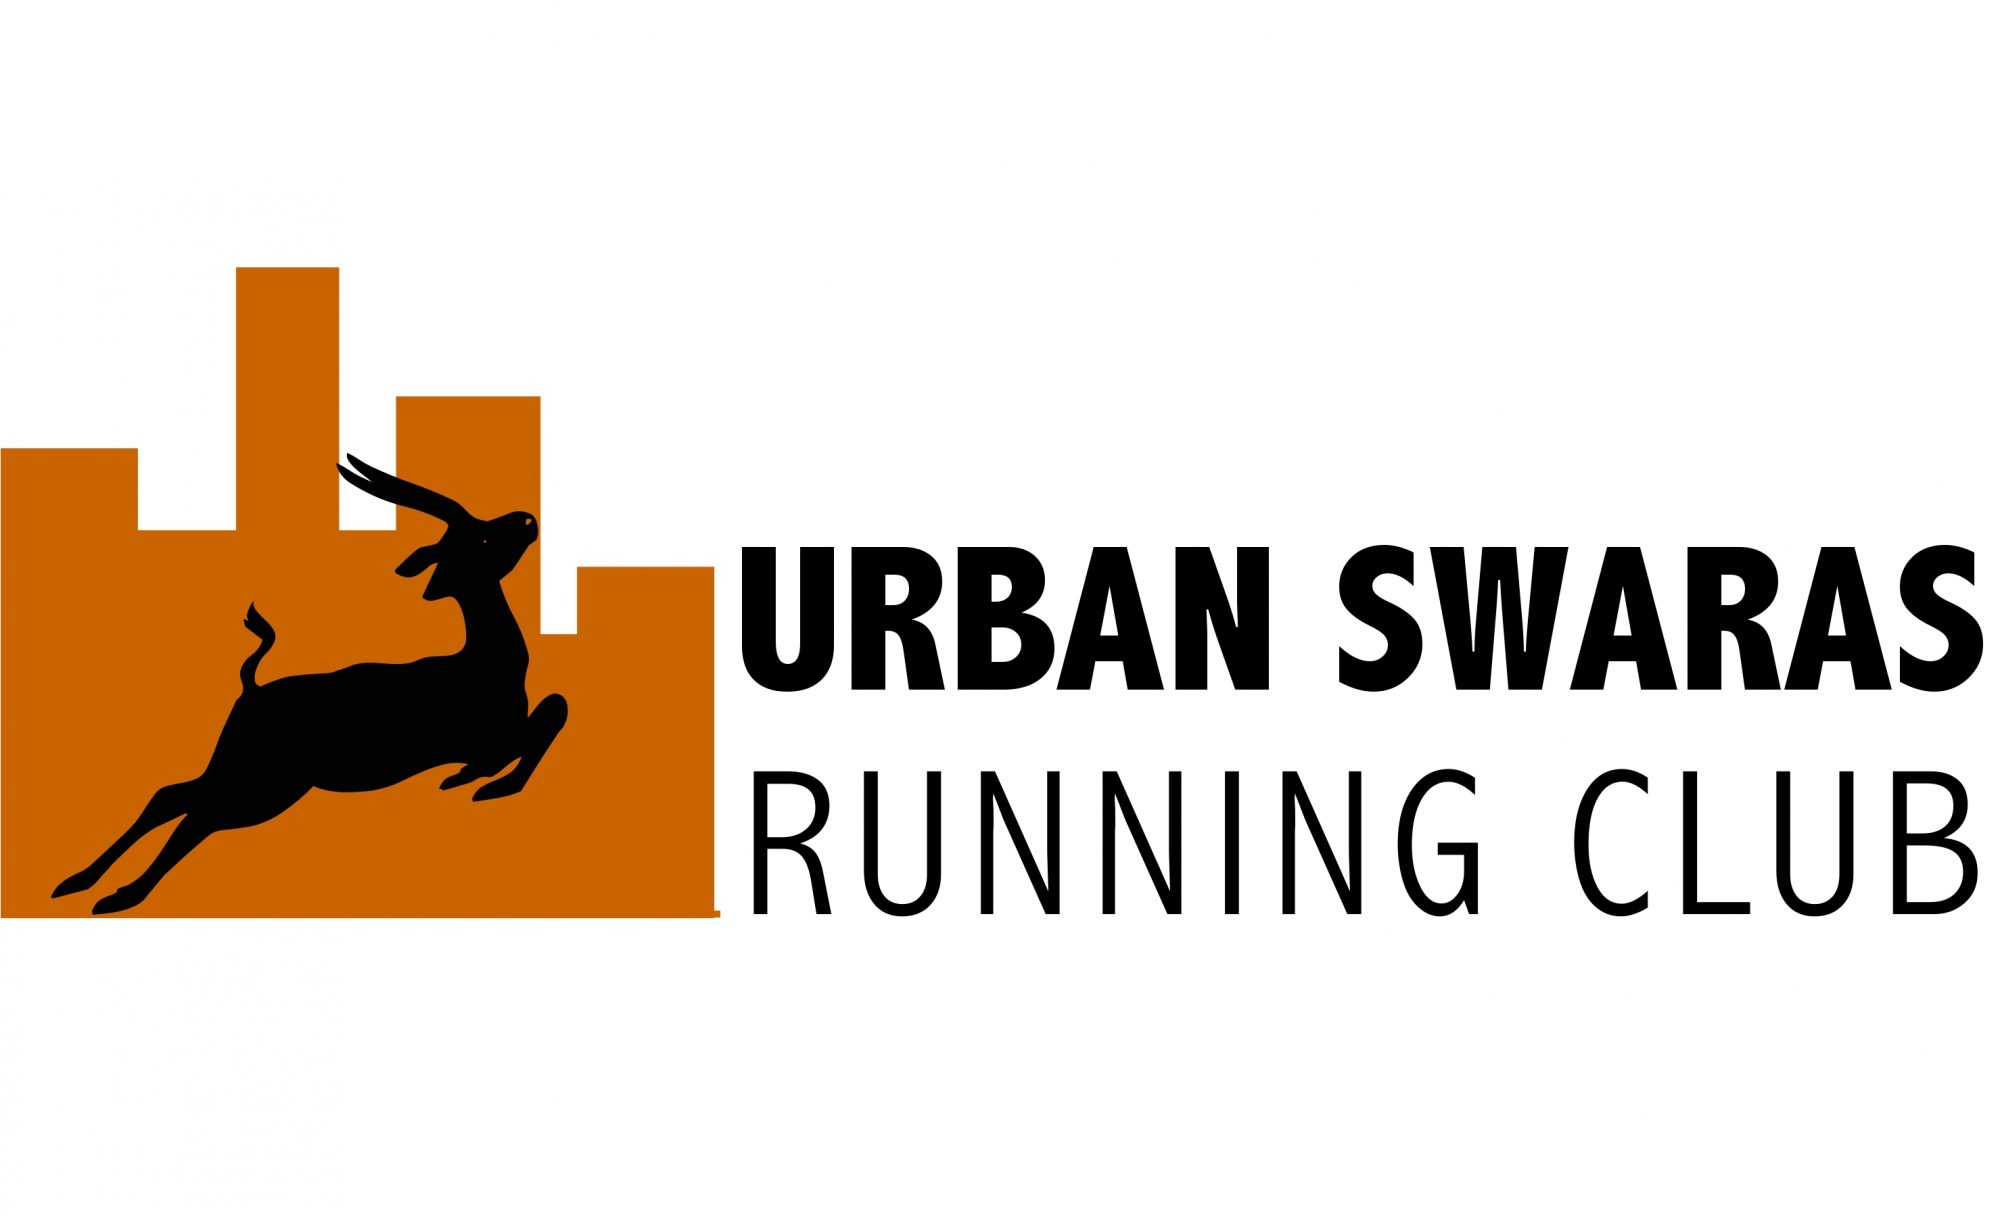 Urban Swaras